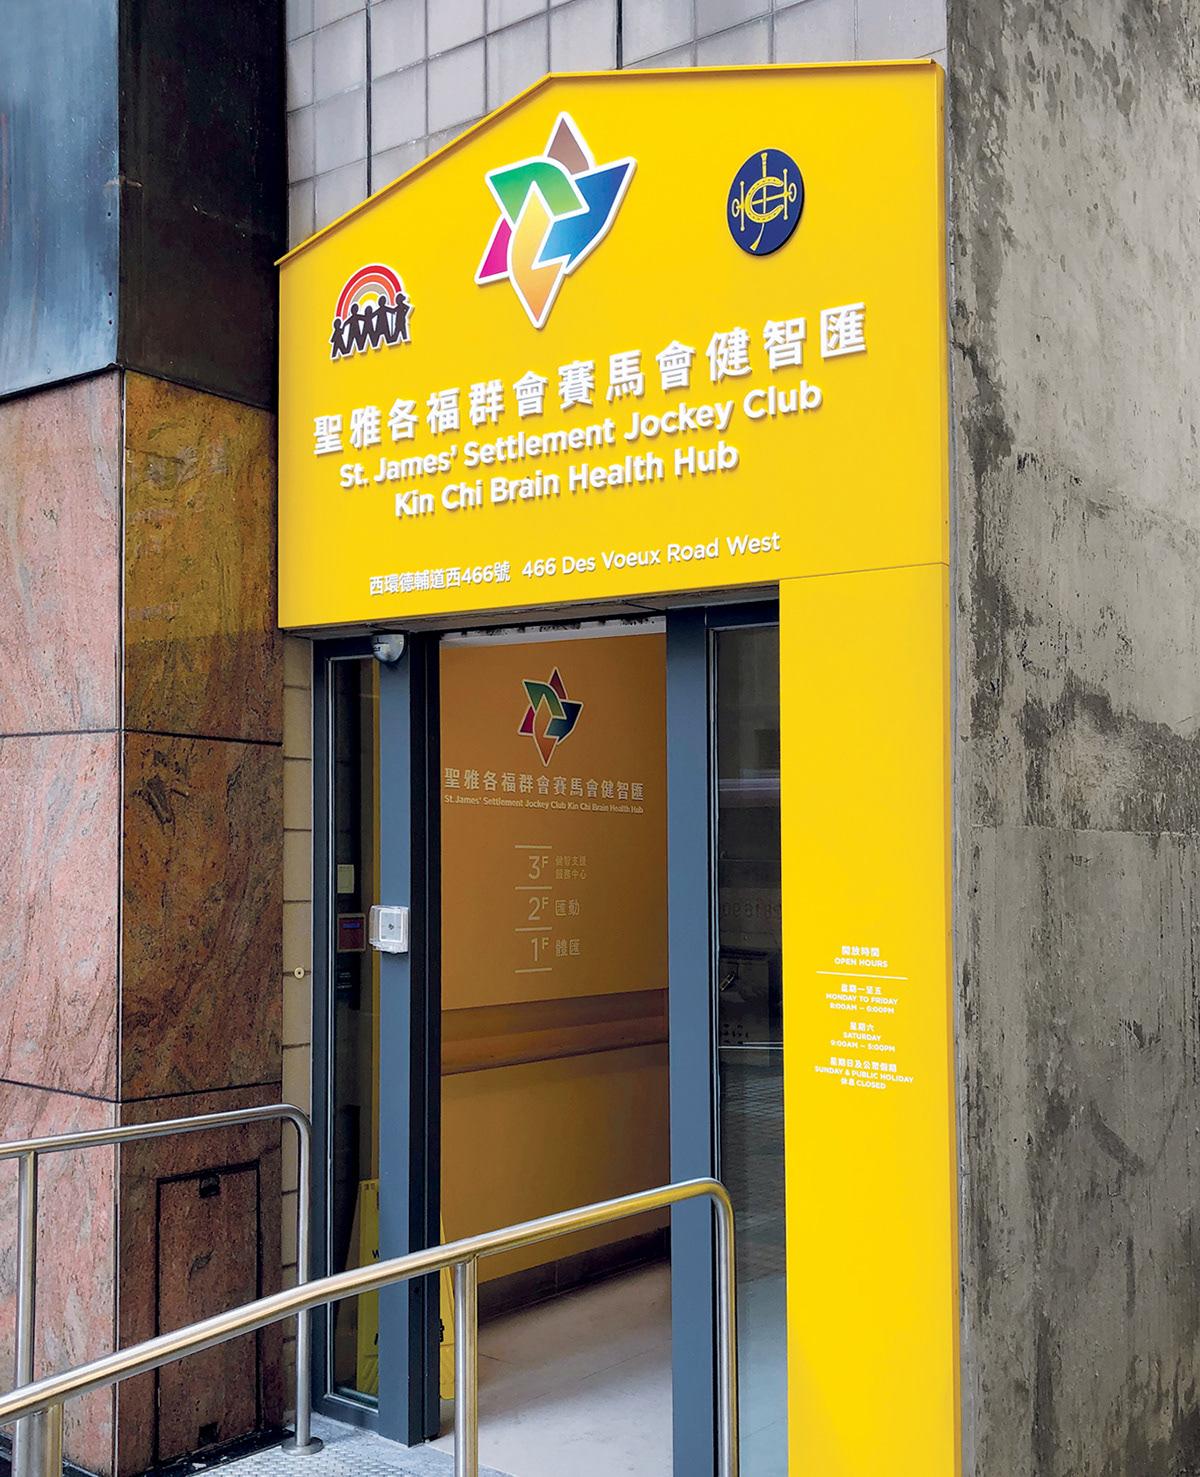 dementia care ILLUSTRATION  Jockey club Kin Chi Brain Health Hub Old Hong Kong signage design ST. JAMES SETTLEMENT visionplus